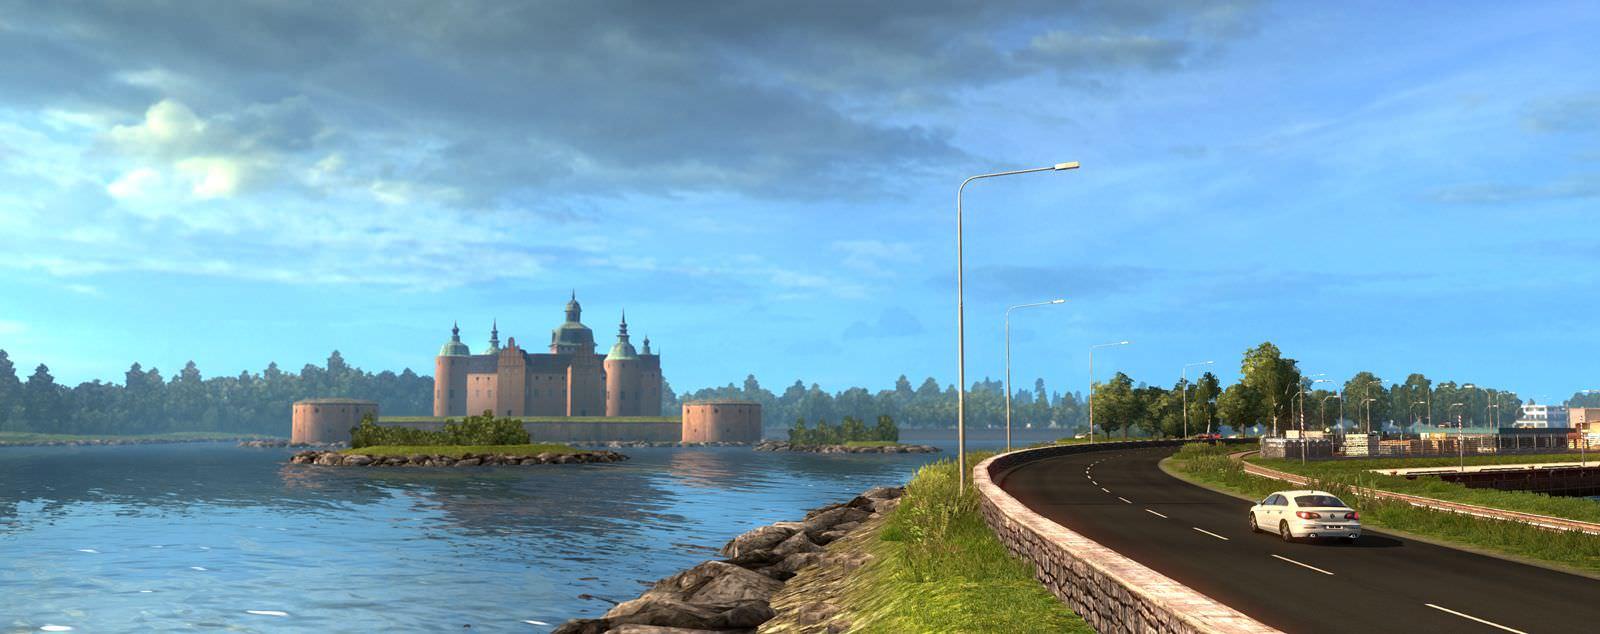 ets2_scandinavia_kalmar_001